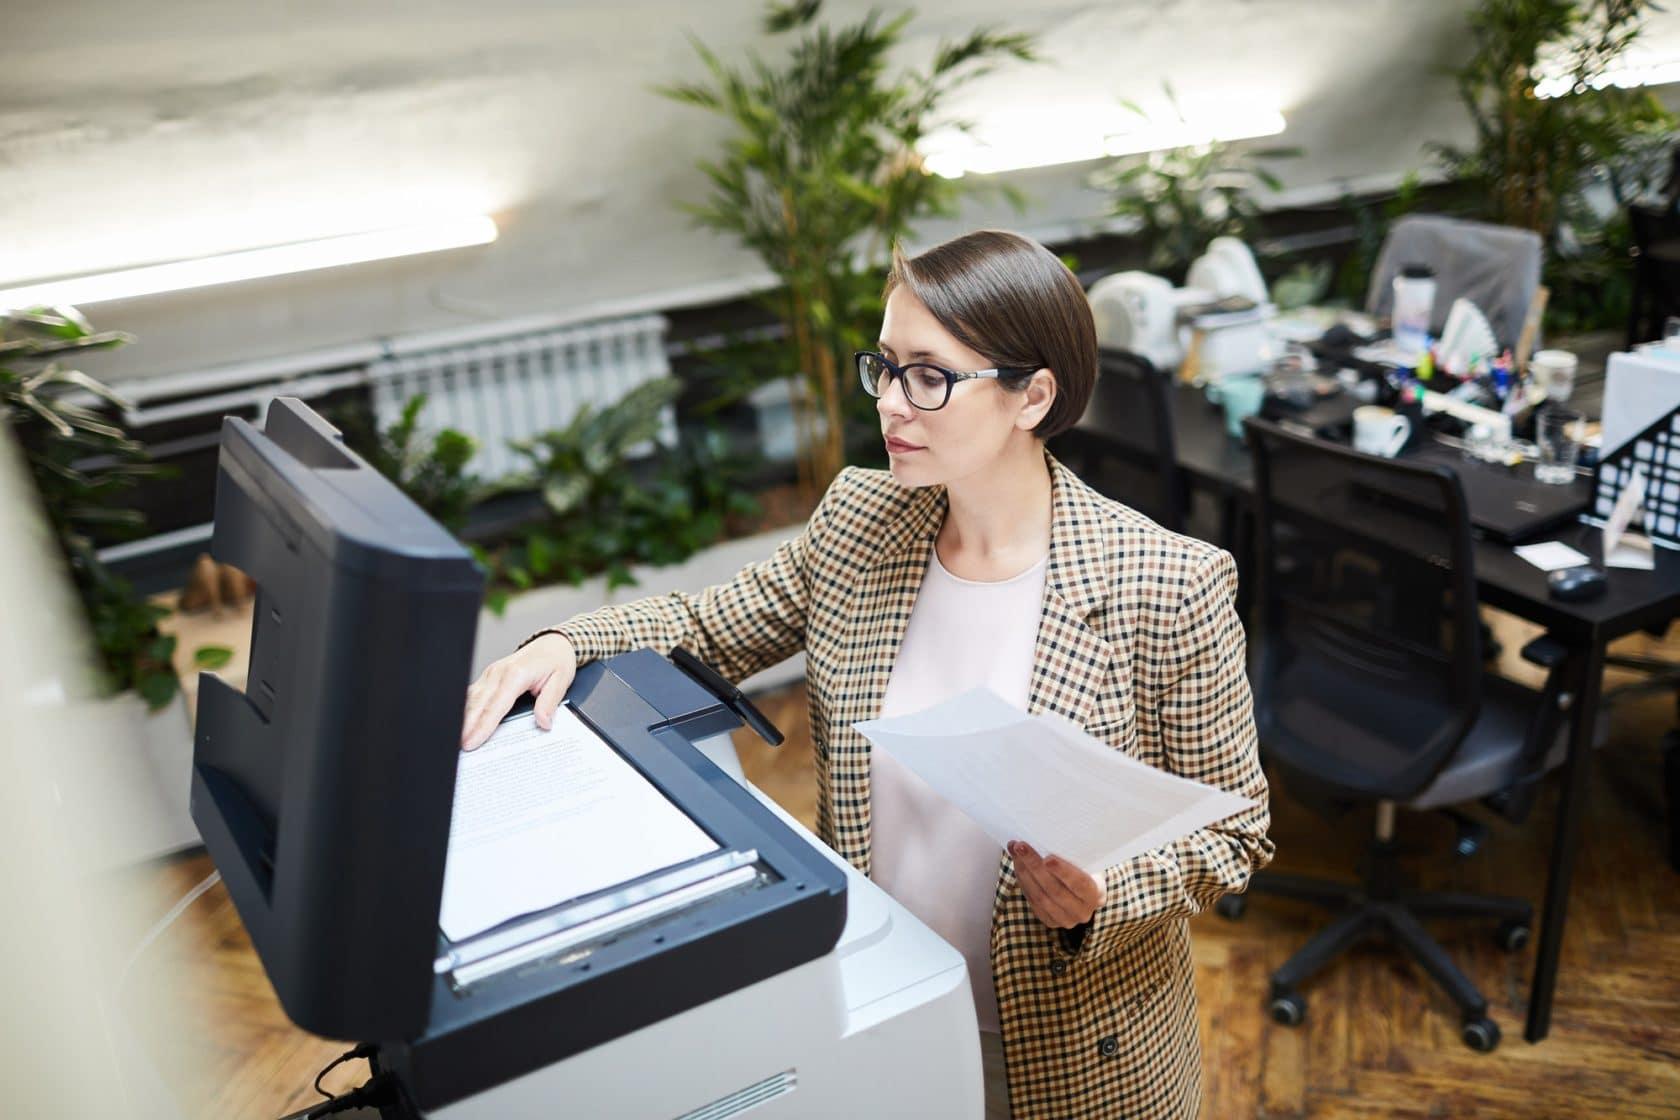 Businesswoman Scanning Documents